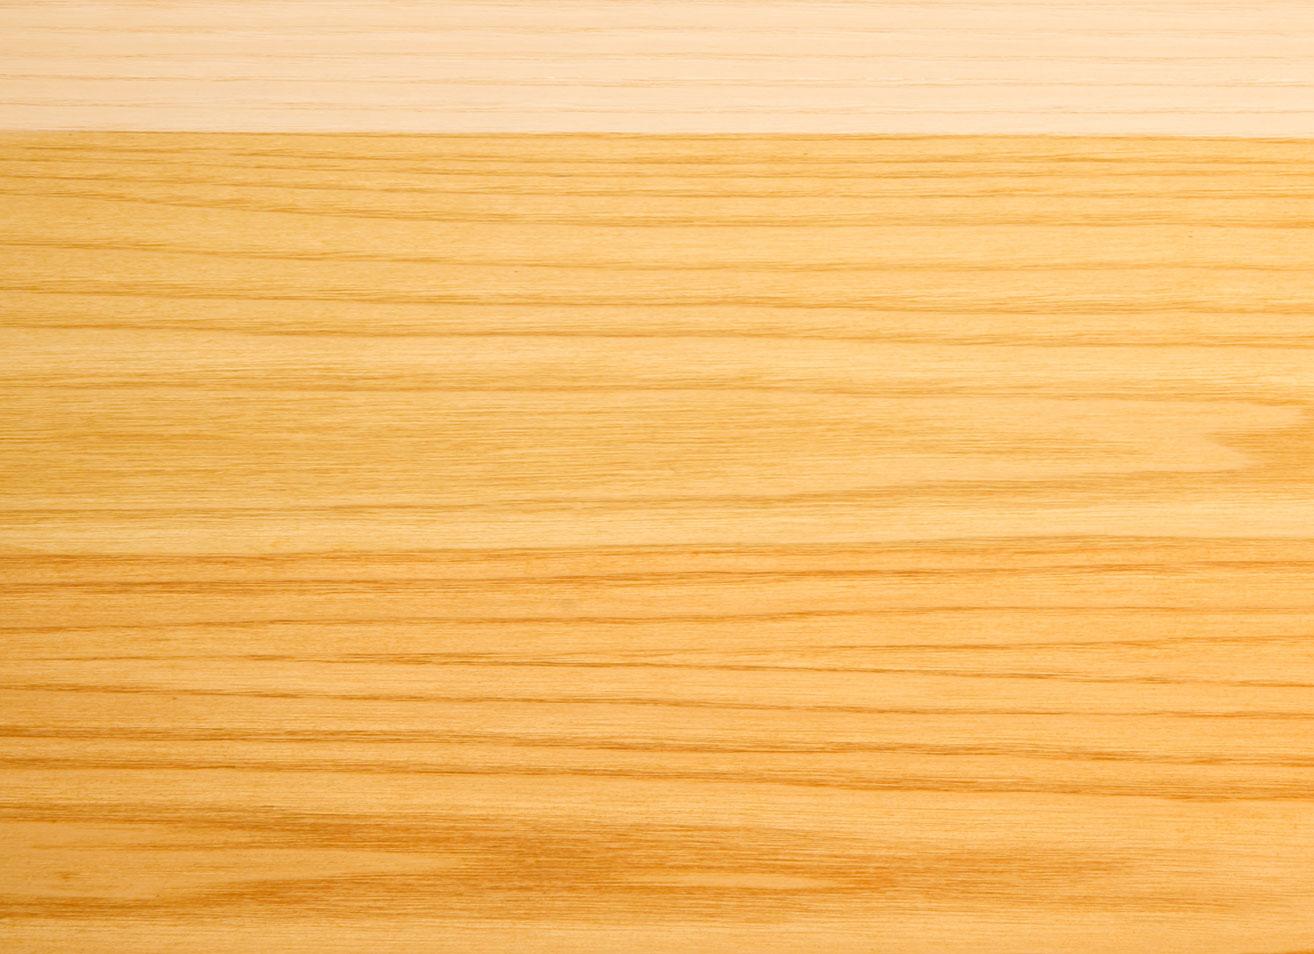 acabado para madera poro abierto pintar